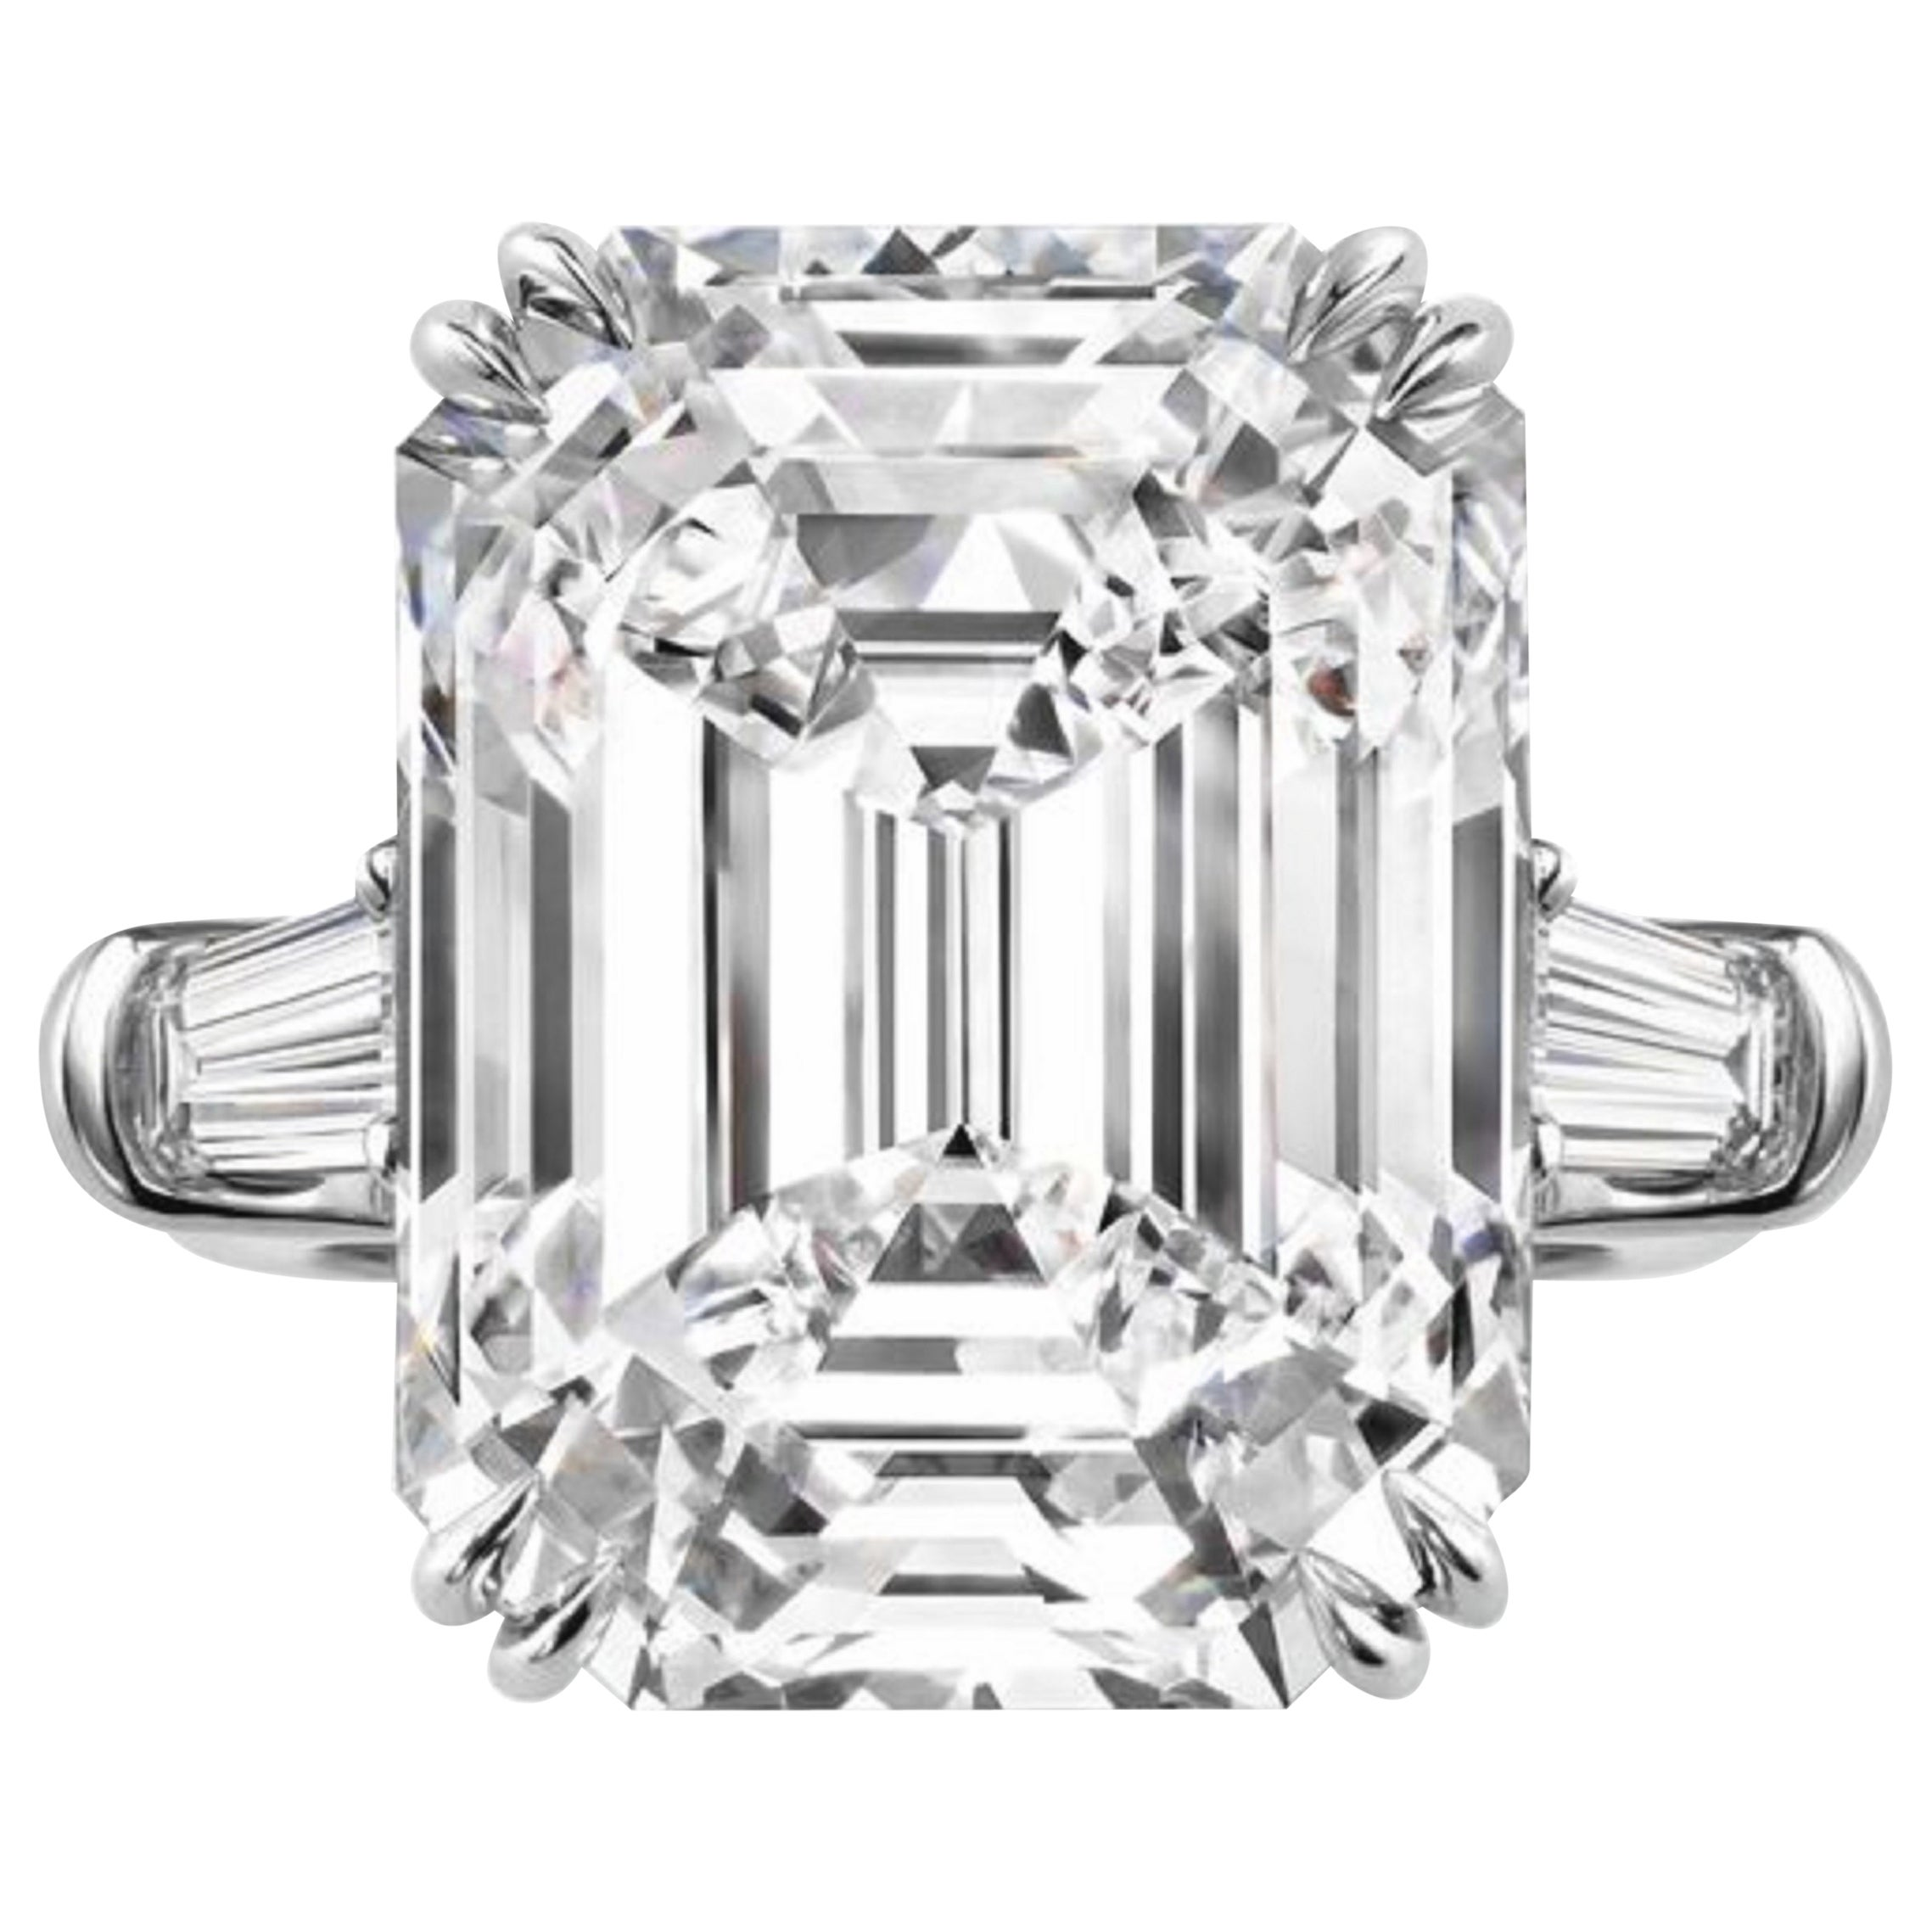 GIA Certified 3.31 Carat Emerald Cut Diamond Ring